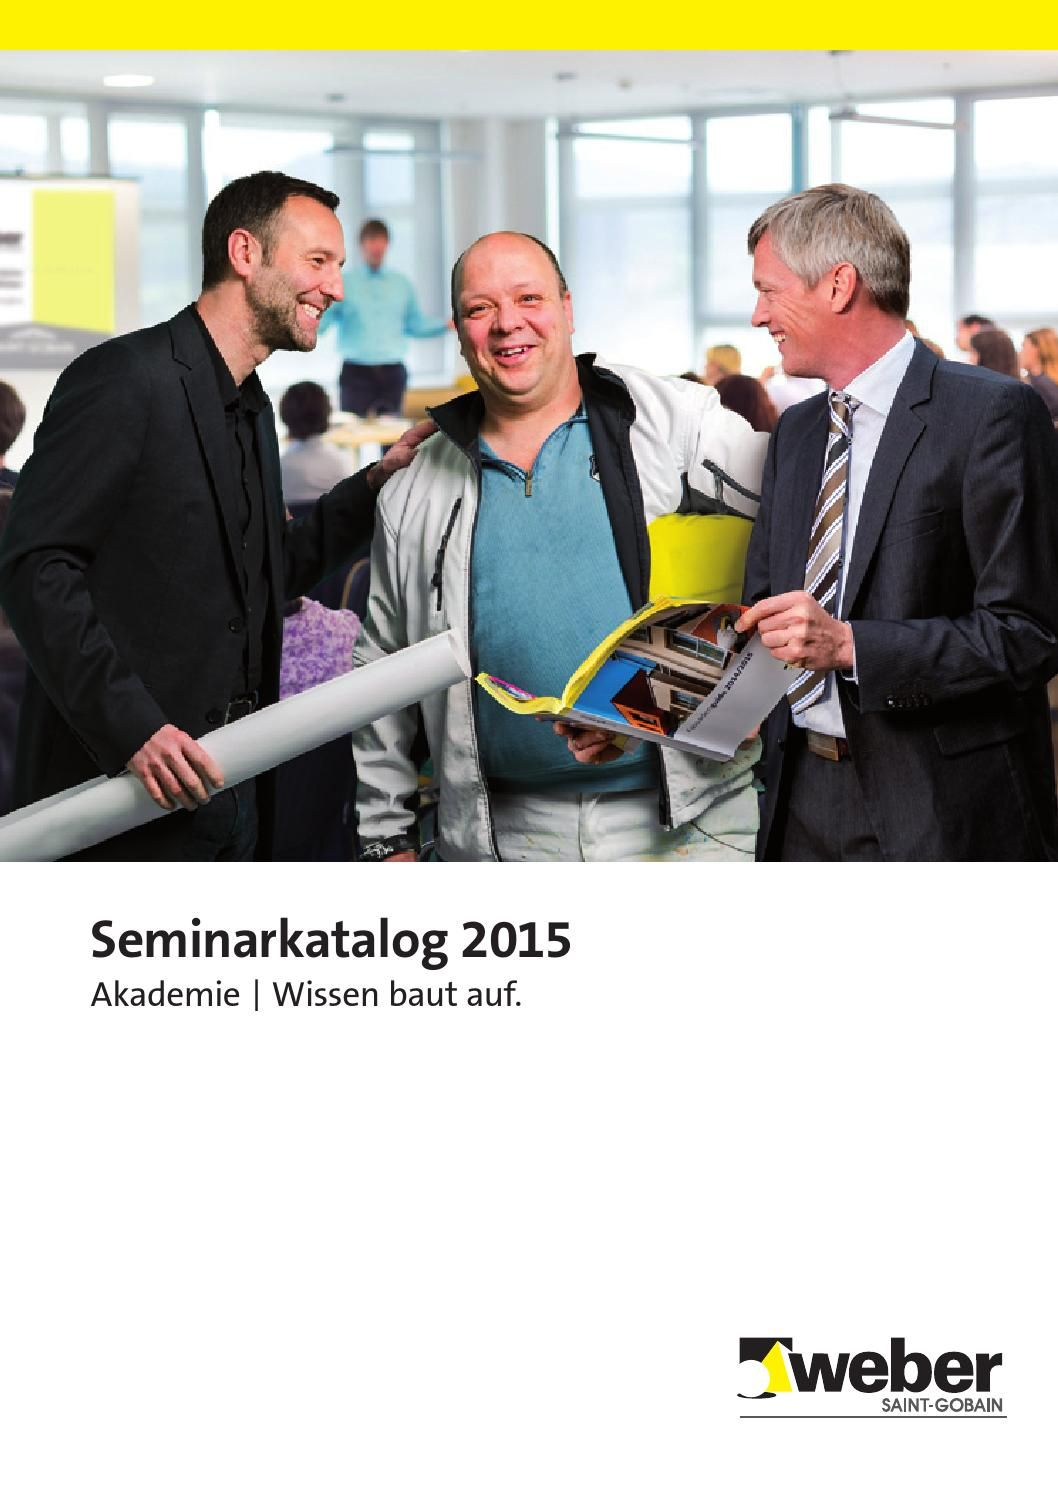 Seminarkatalog 2015, #Akademie, #SGWeber, #Saint-Gobain, #Weber